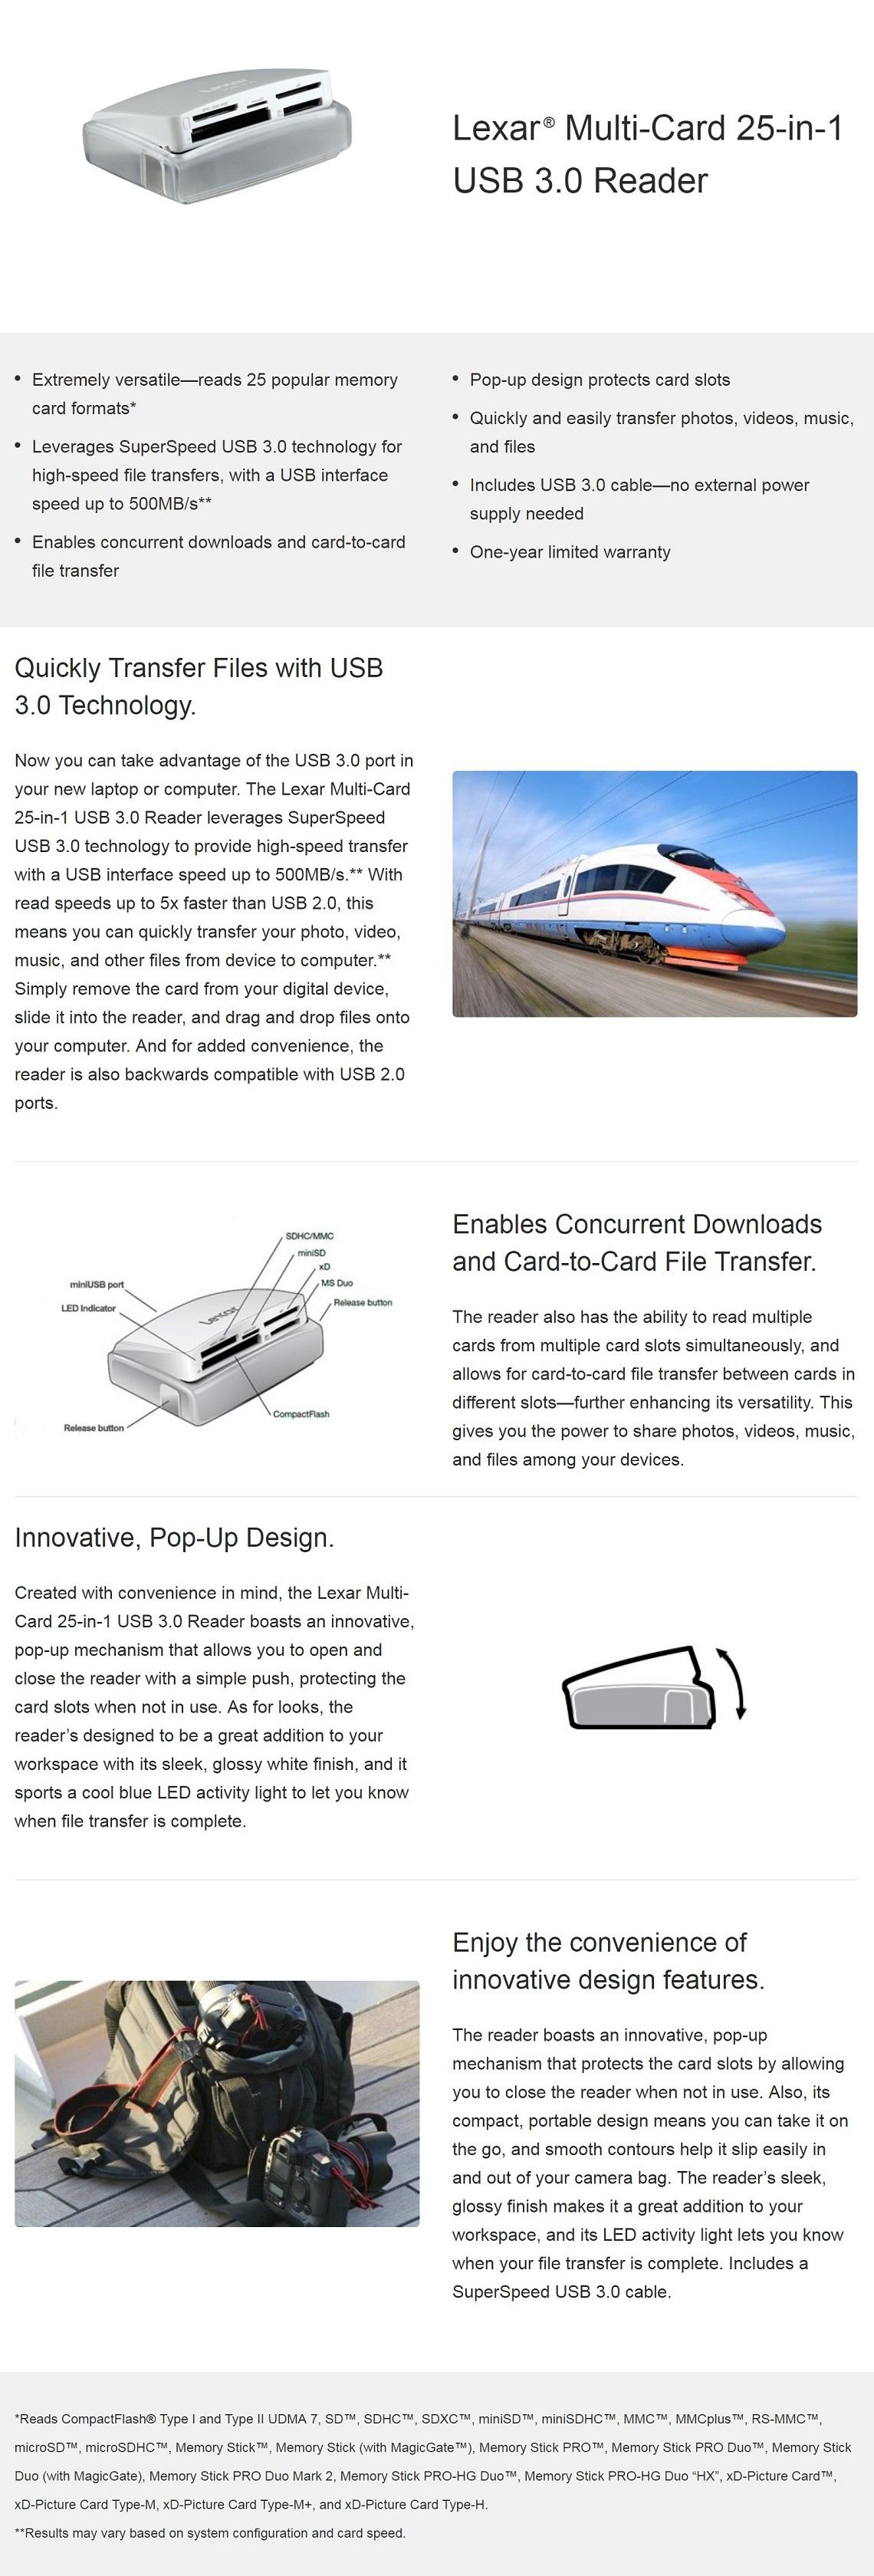 Lexar External 25-in-1 USB 3.0 Multi Card Reader - Fast Transfers 500MBs Read